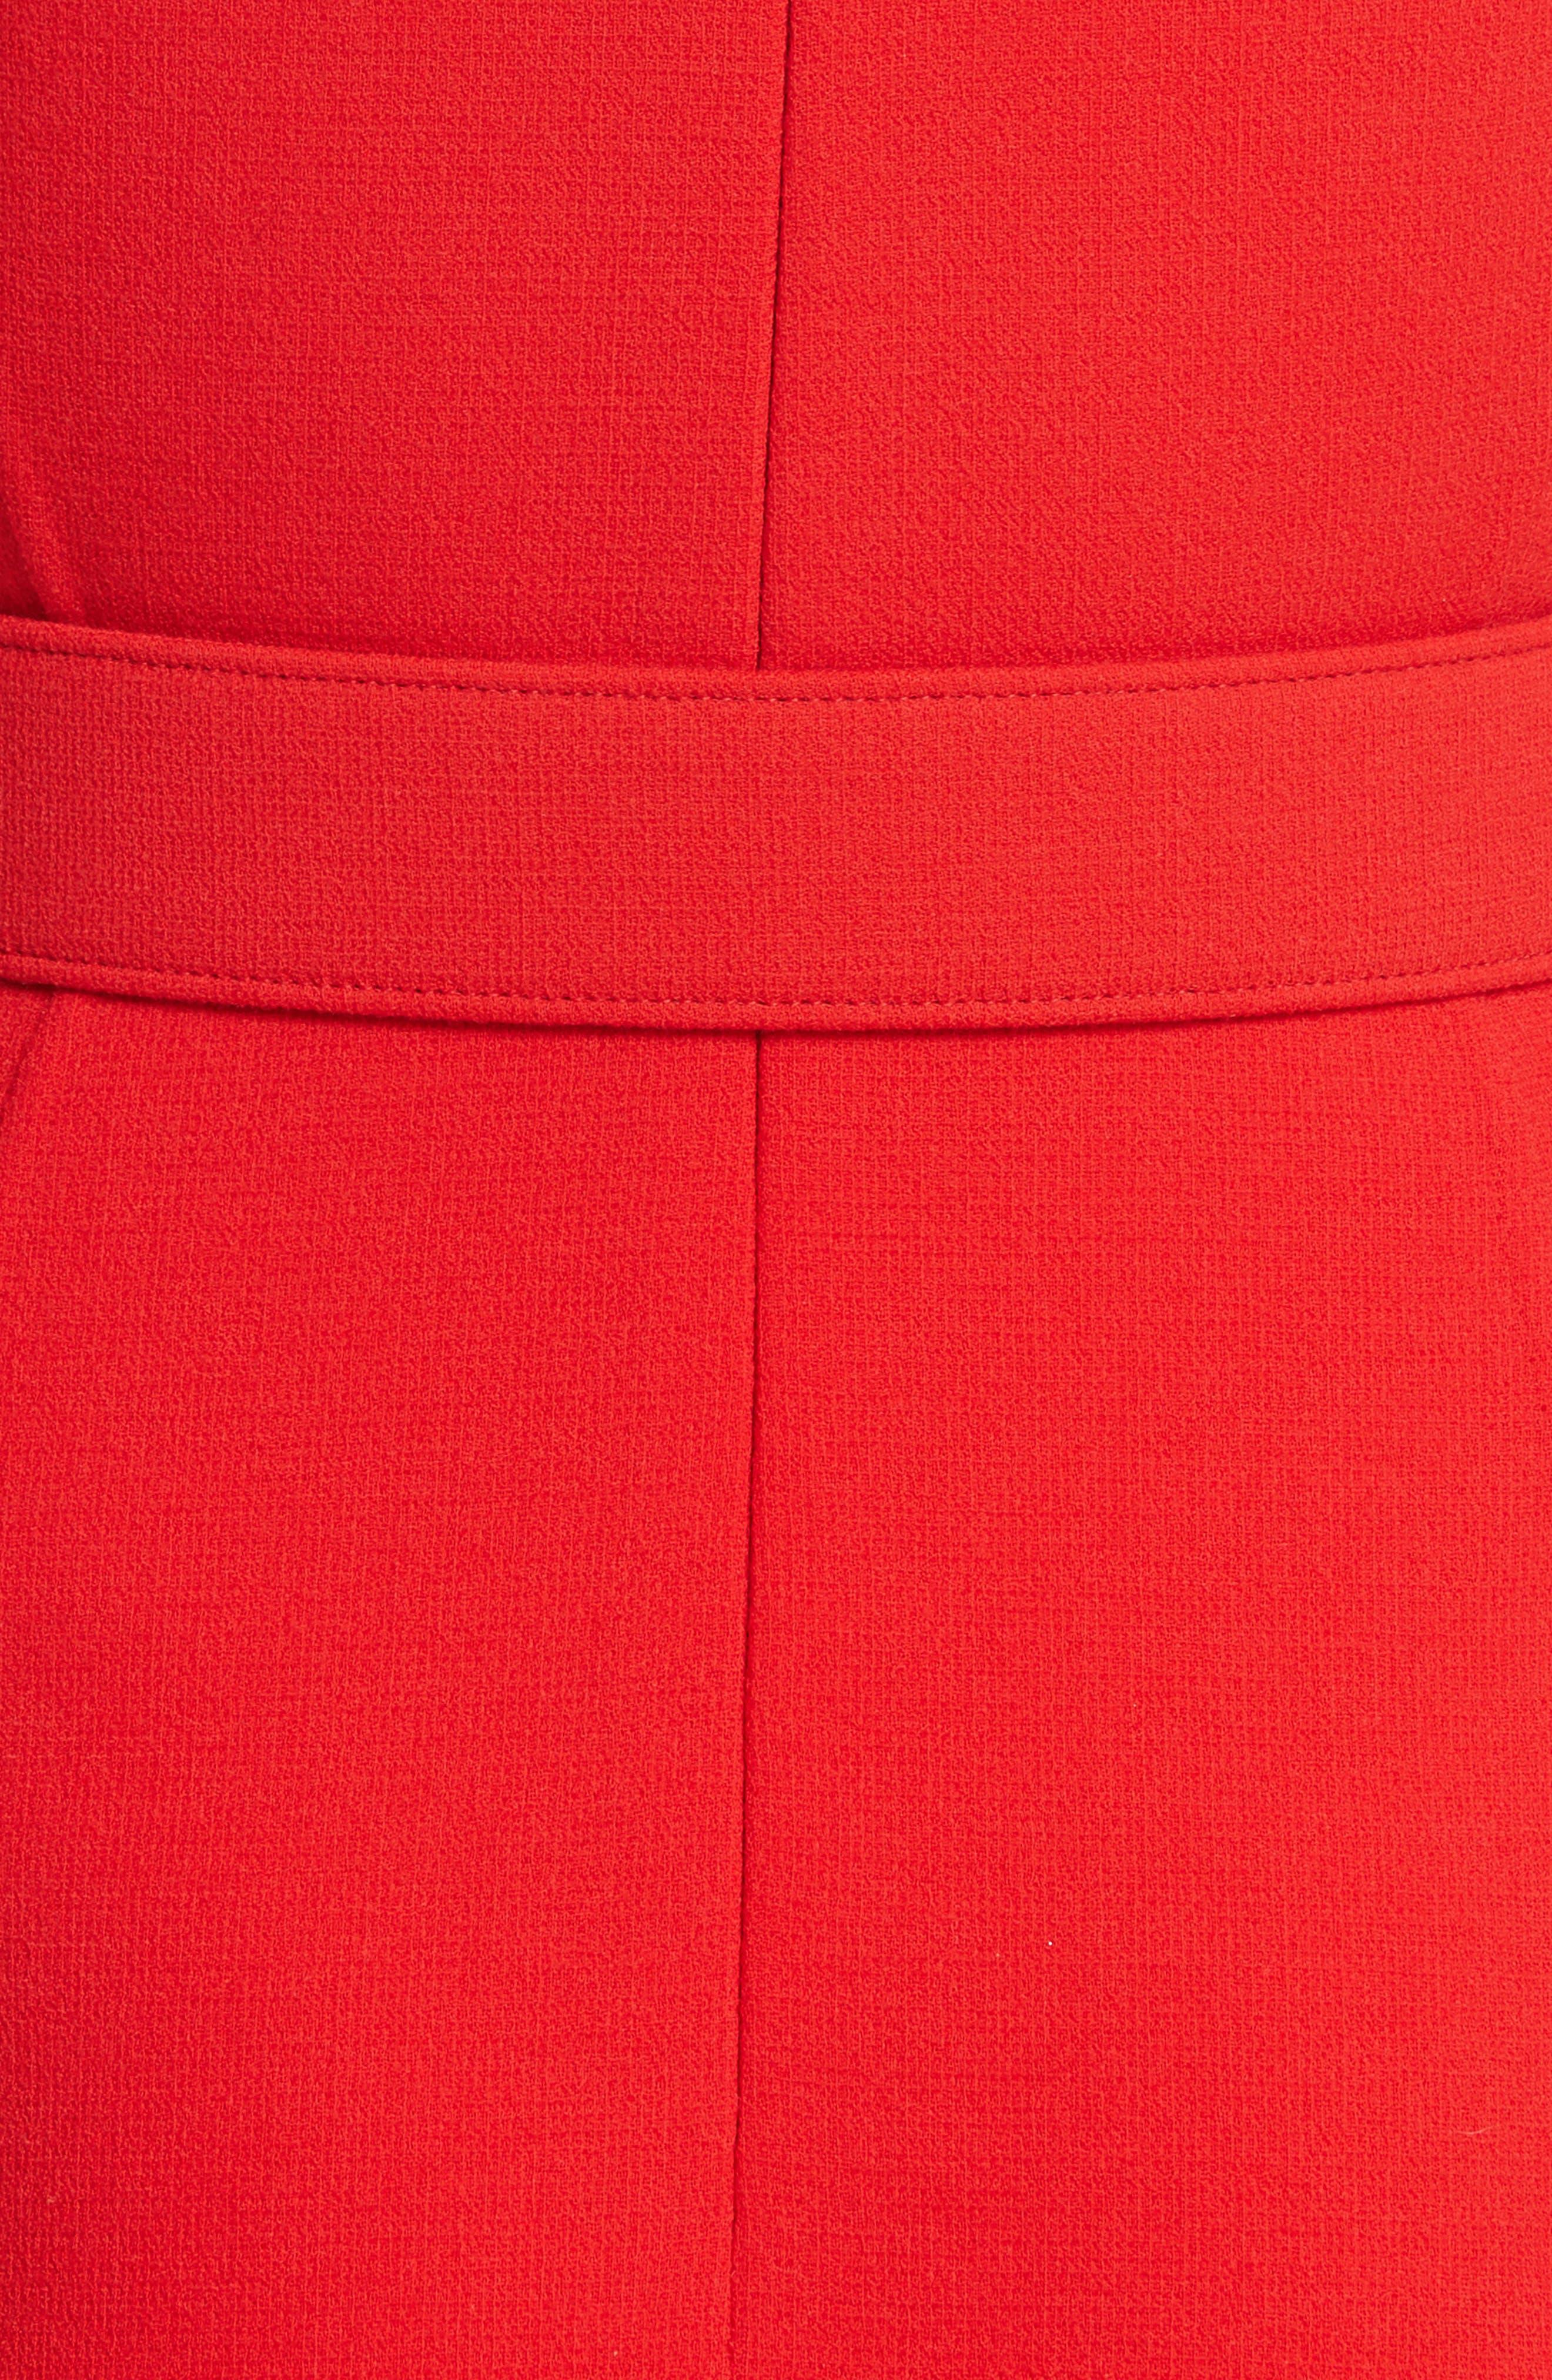 Crepe Fit & Flare Dress,                             Alternate thumbnail 5, color,                             620